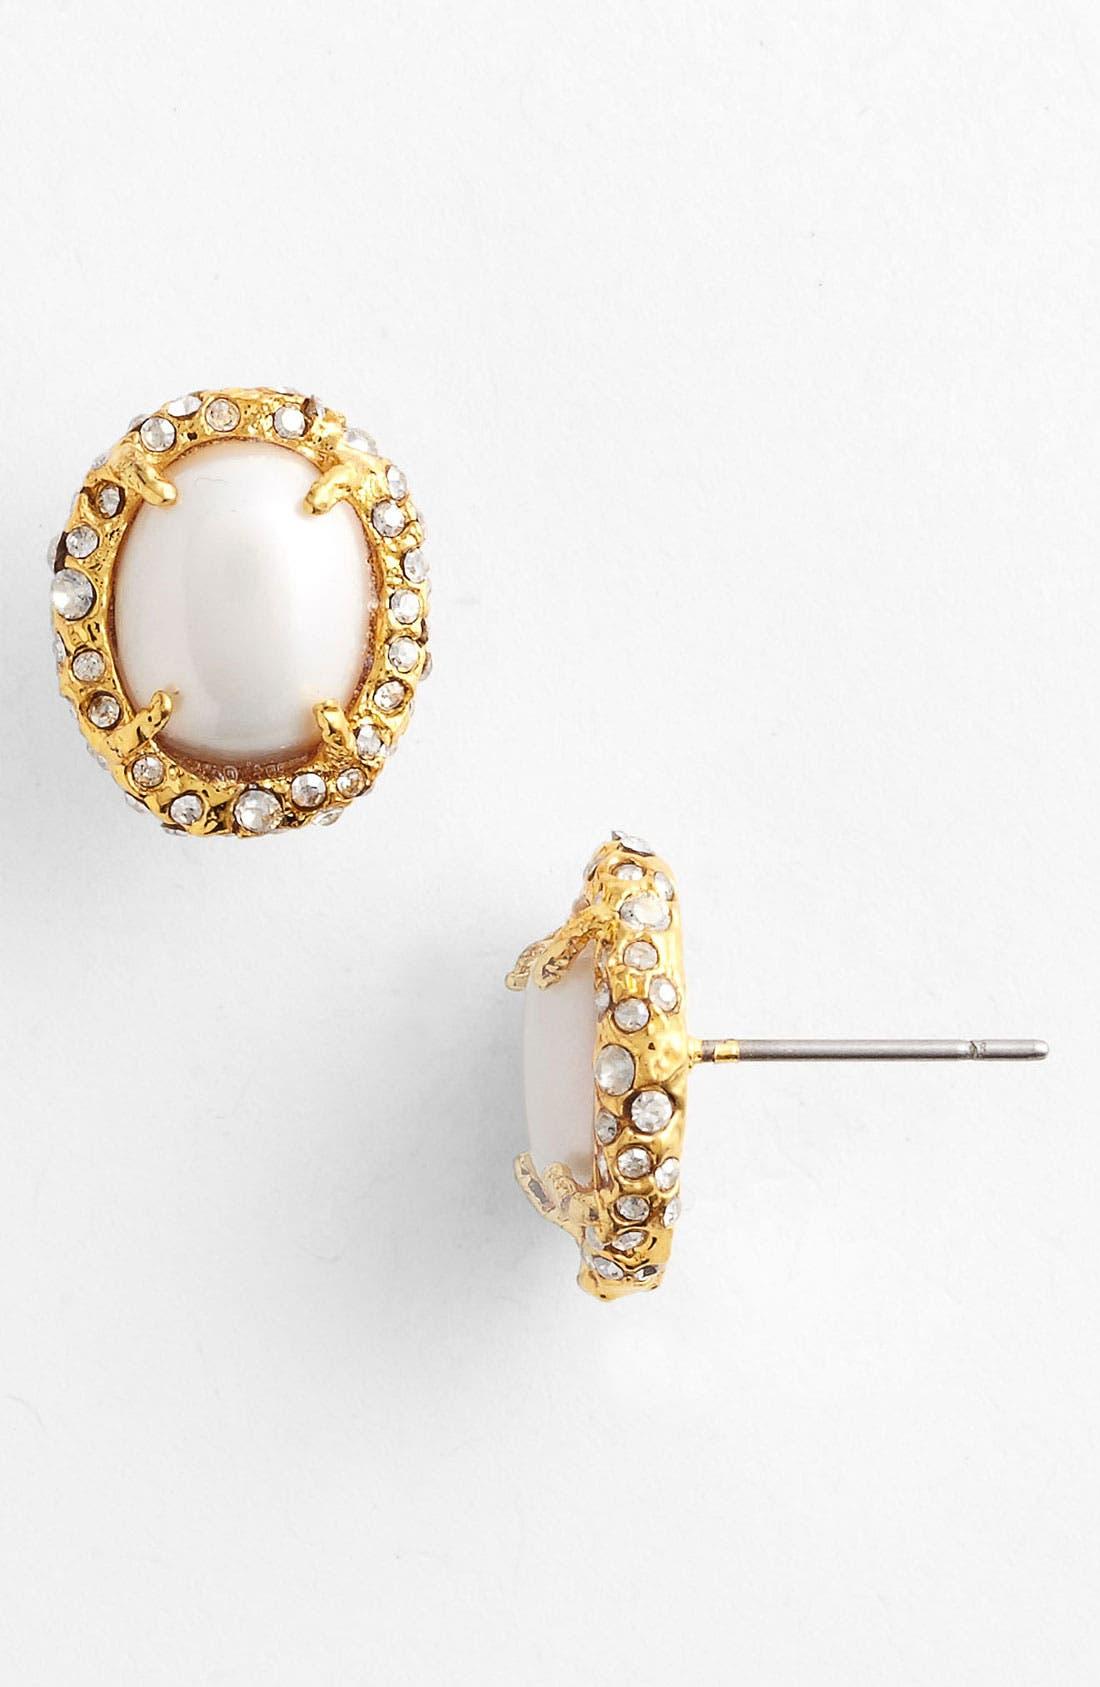 Alternate Image 1 Selected - Alexis Bittar 'Elements - Siyabona' Stone Stud Earrings